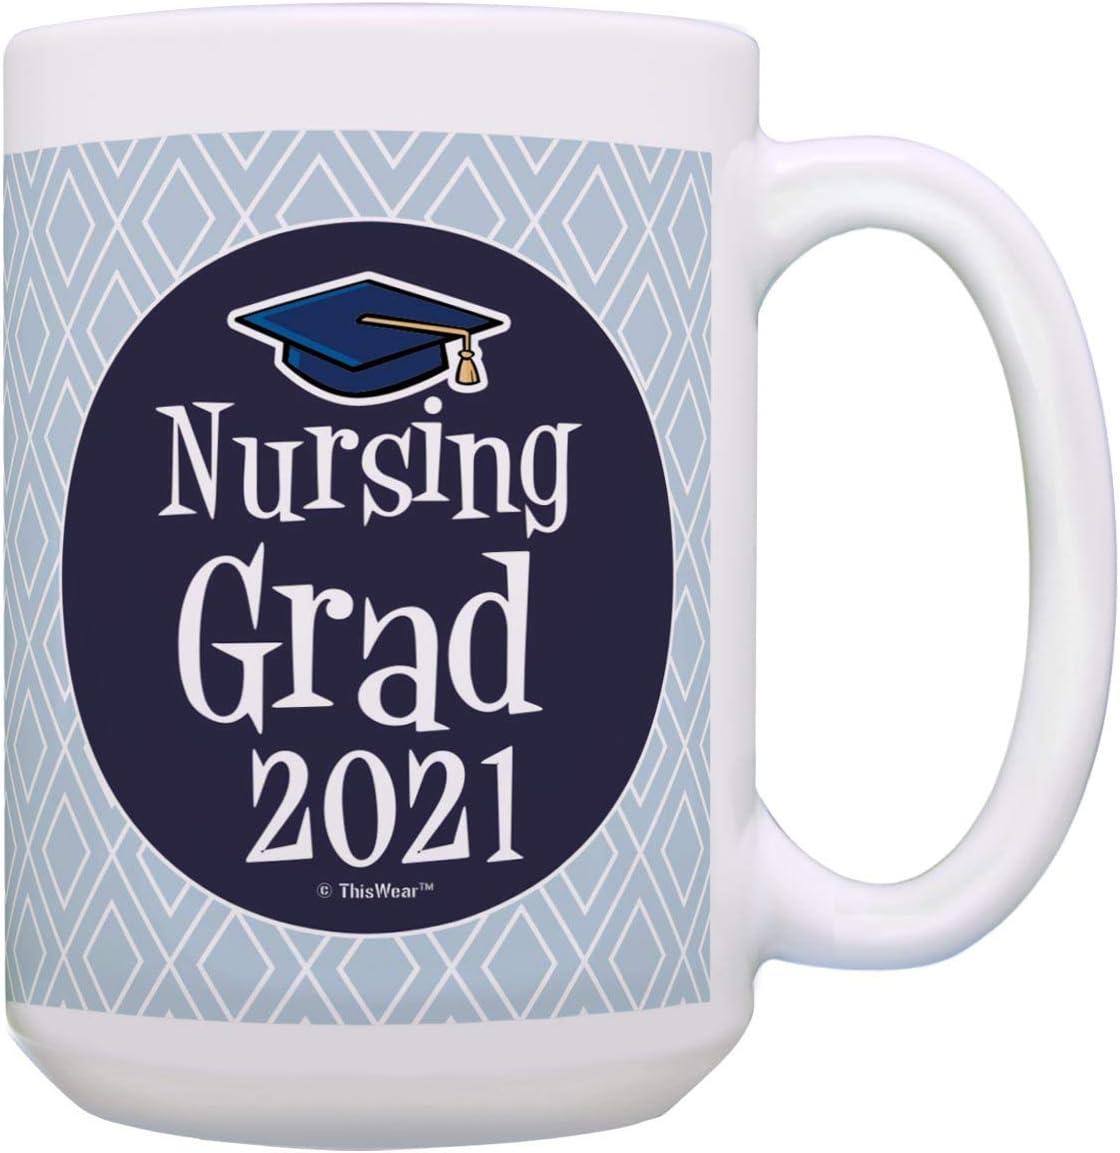 Gift for Nurse Graduation Fridge Magnet 2.5 x 3.5